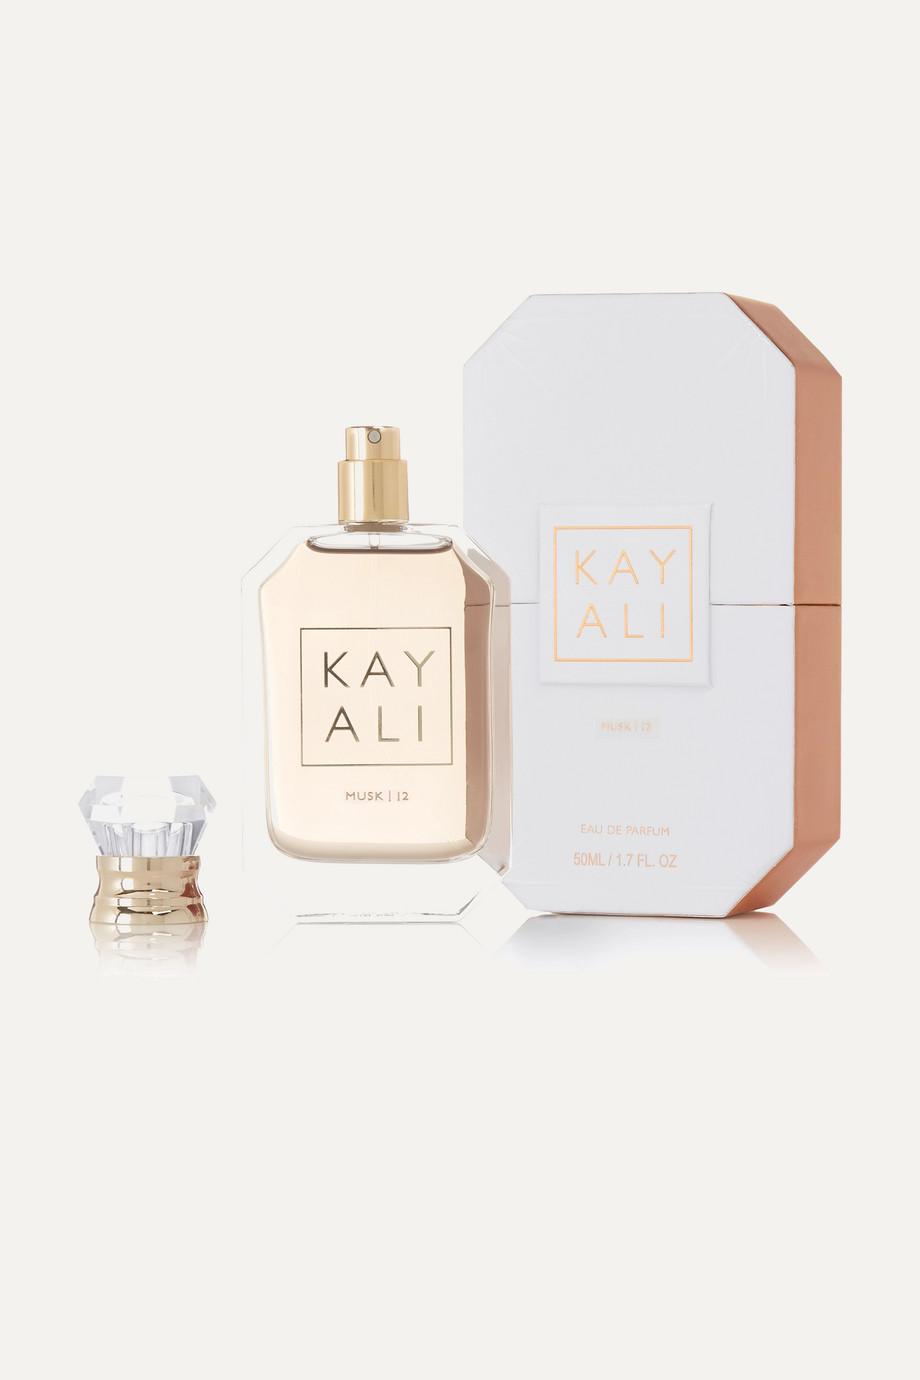 Huda Beauty Kayali Eau de Parfum - Musk 12, 50ml